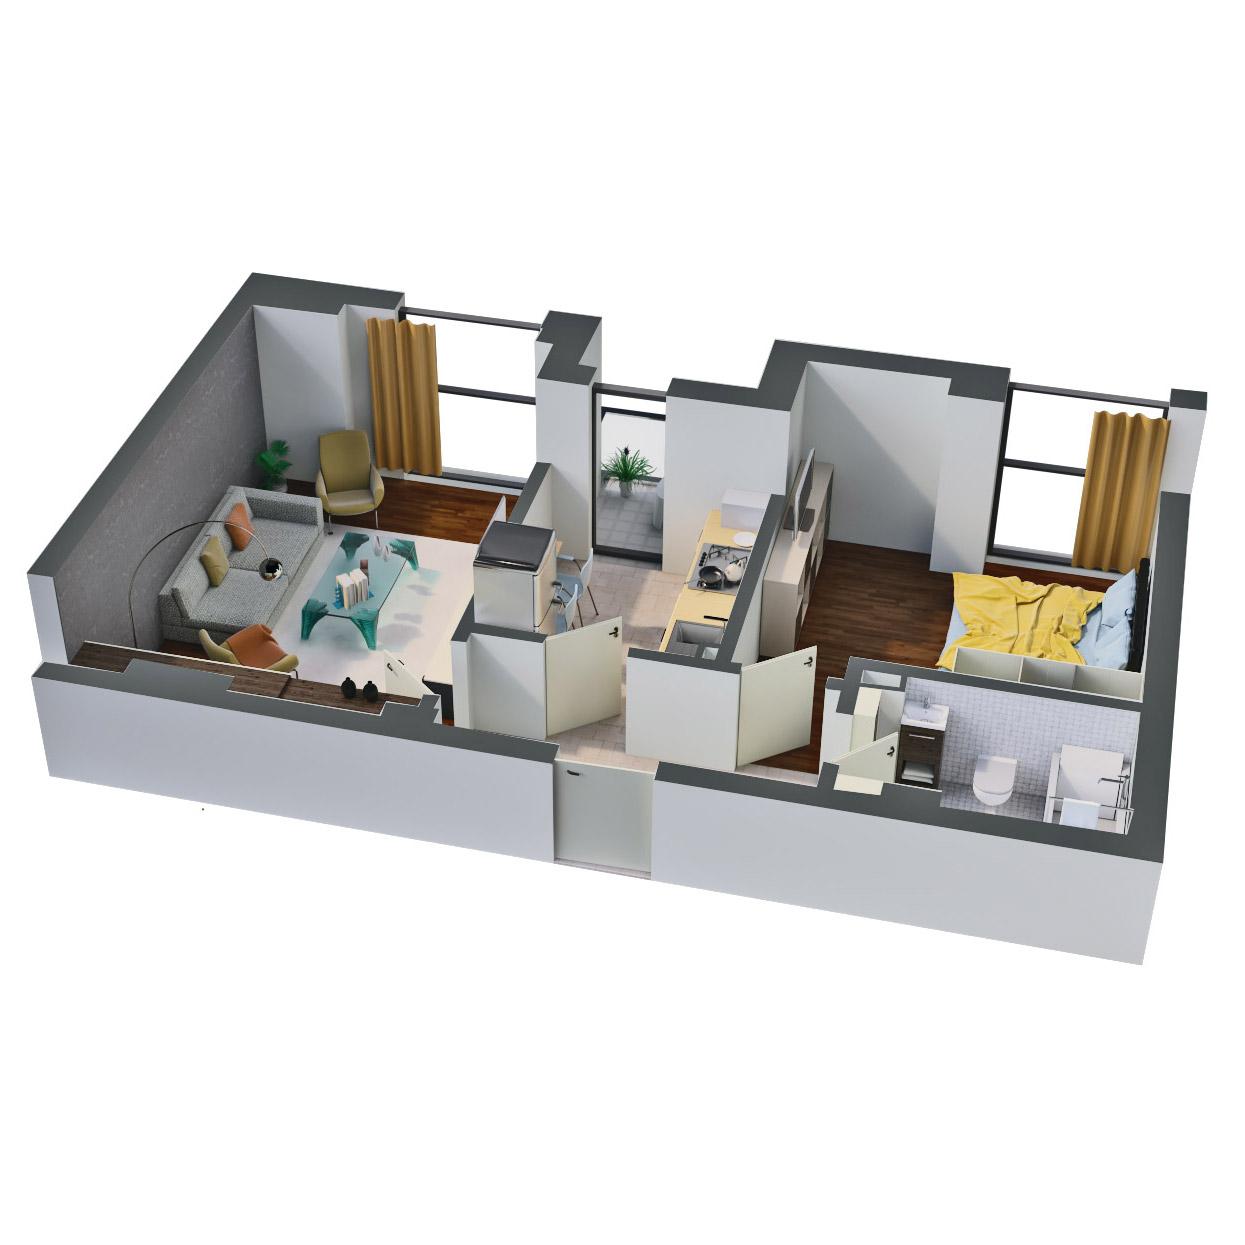 Apartament 2 camere de vanzare Bucuresti - Catedral Residence - Marriott, Piata Unirii, 13 Septembrie, Izvor - Tip 1 - T2 - D